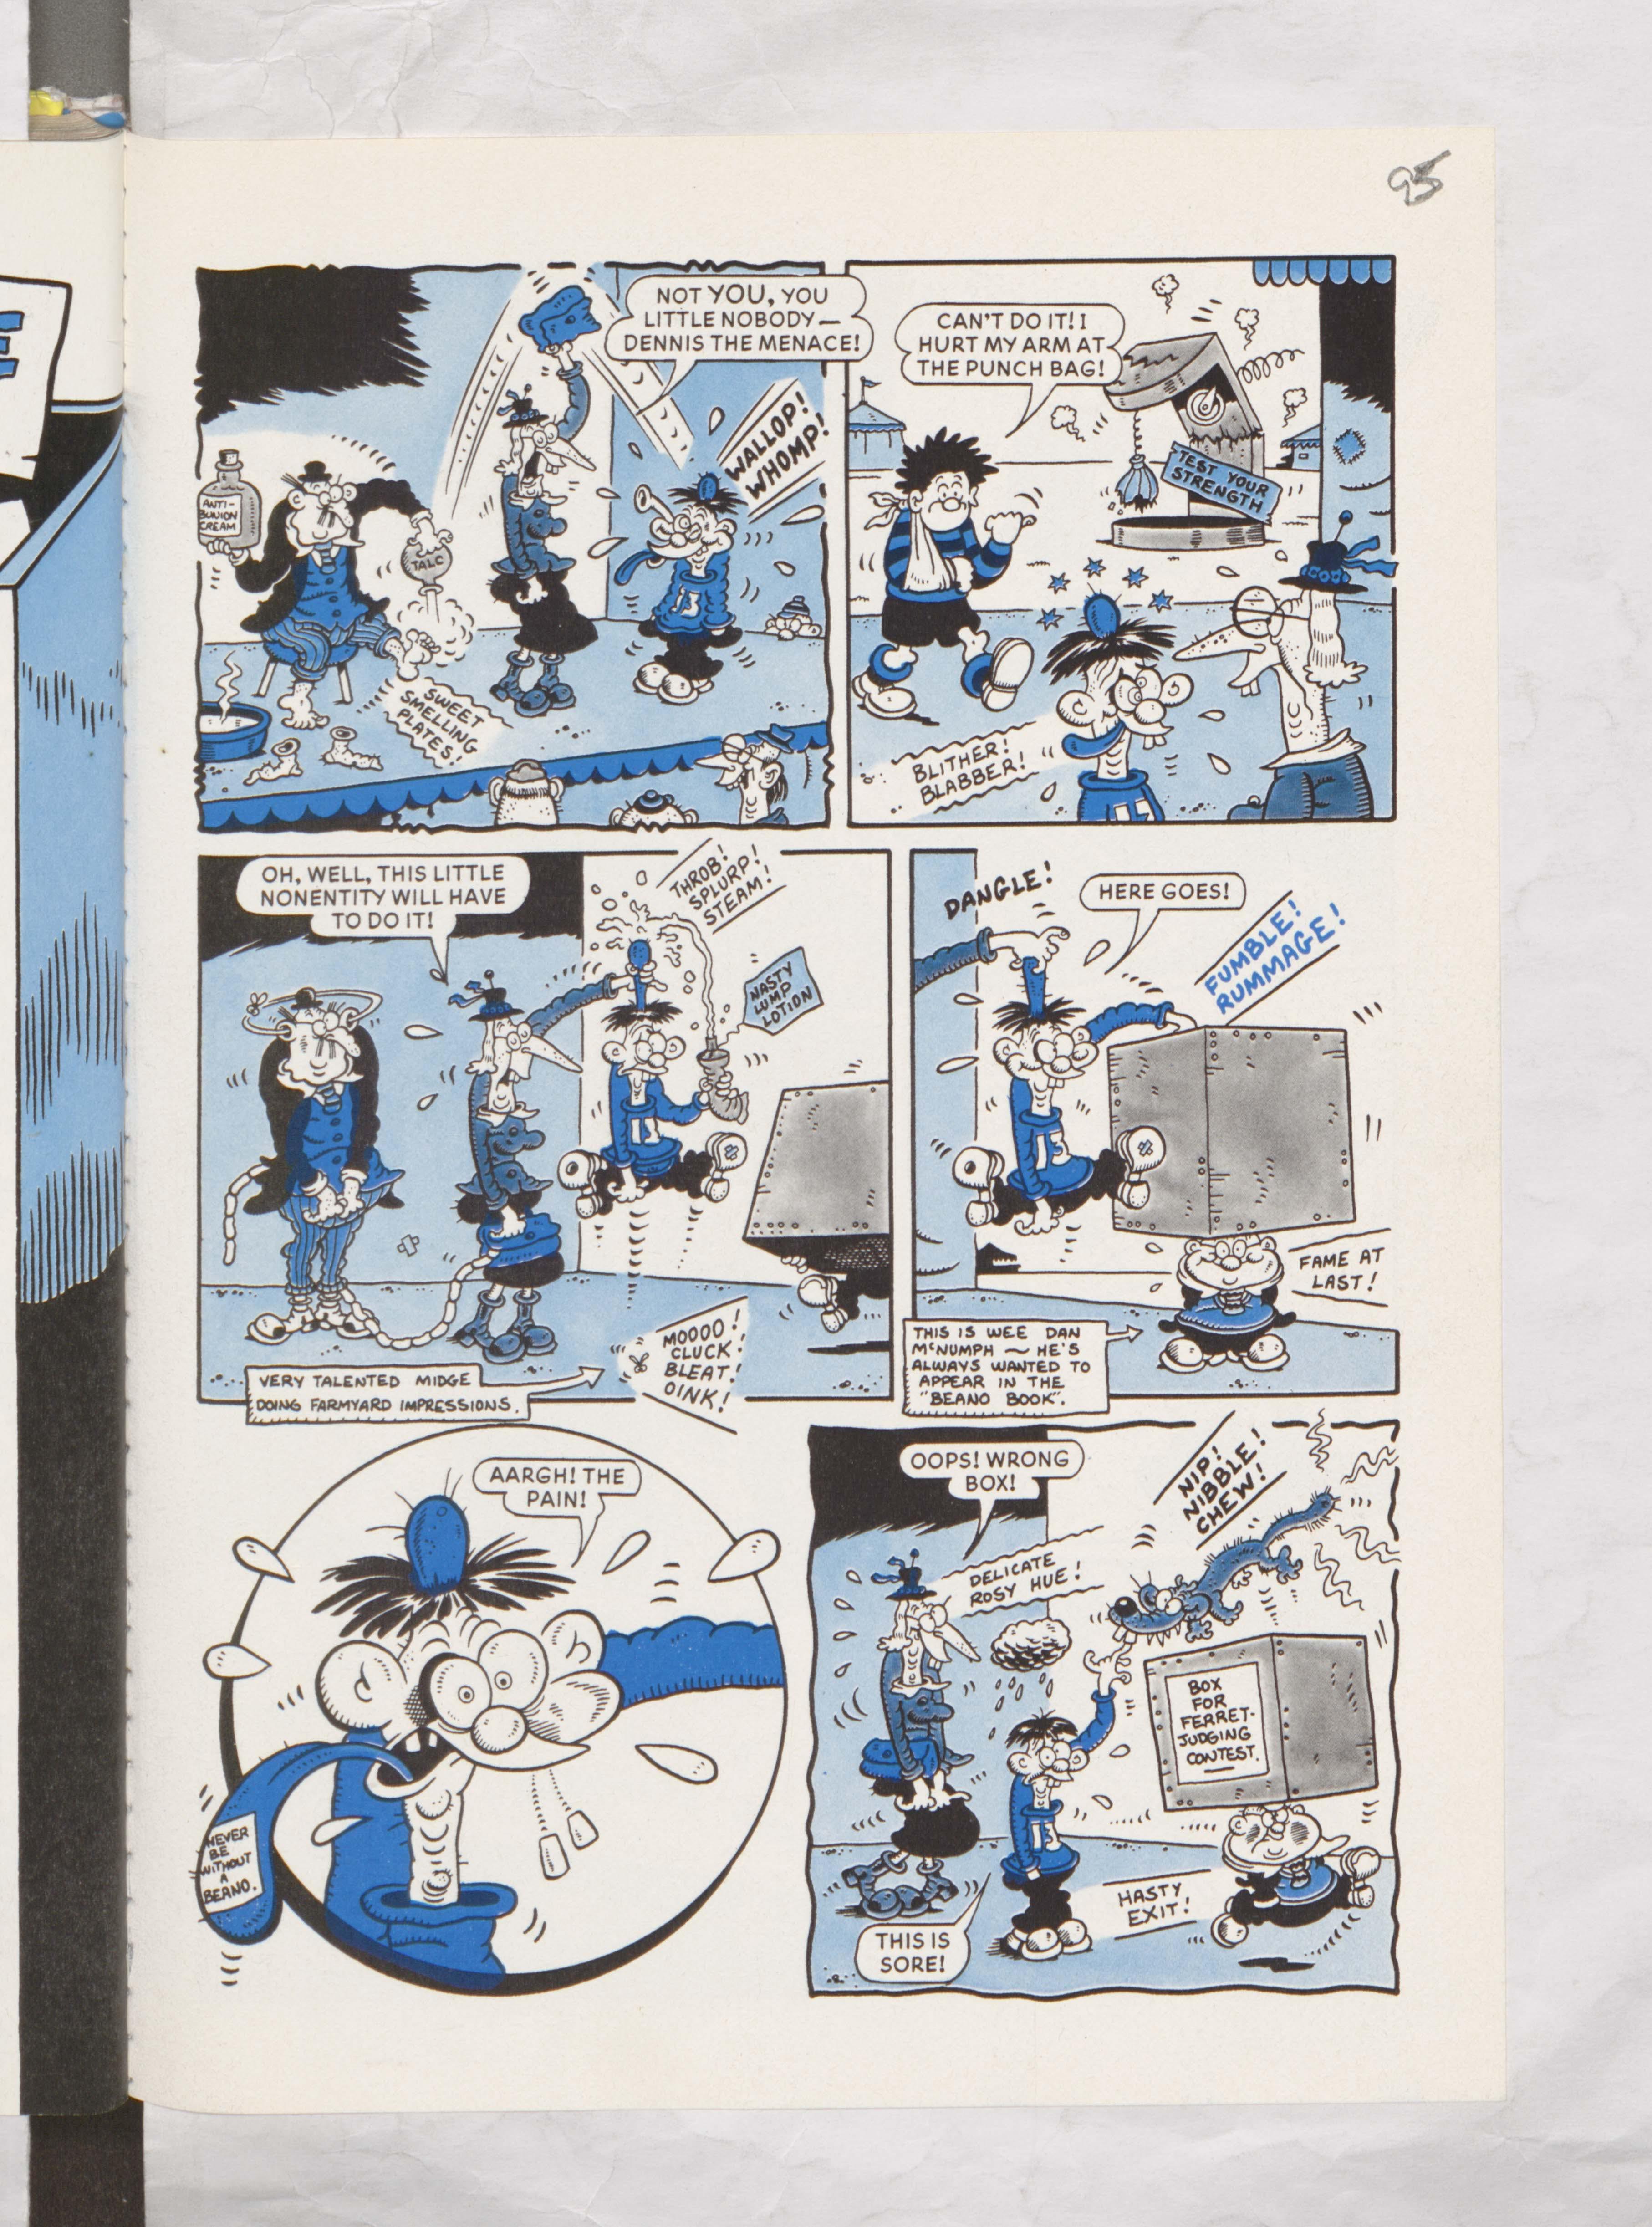 Calamity James Beano Book 1988 Annual